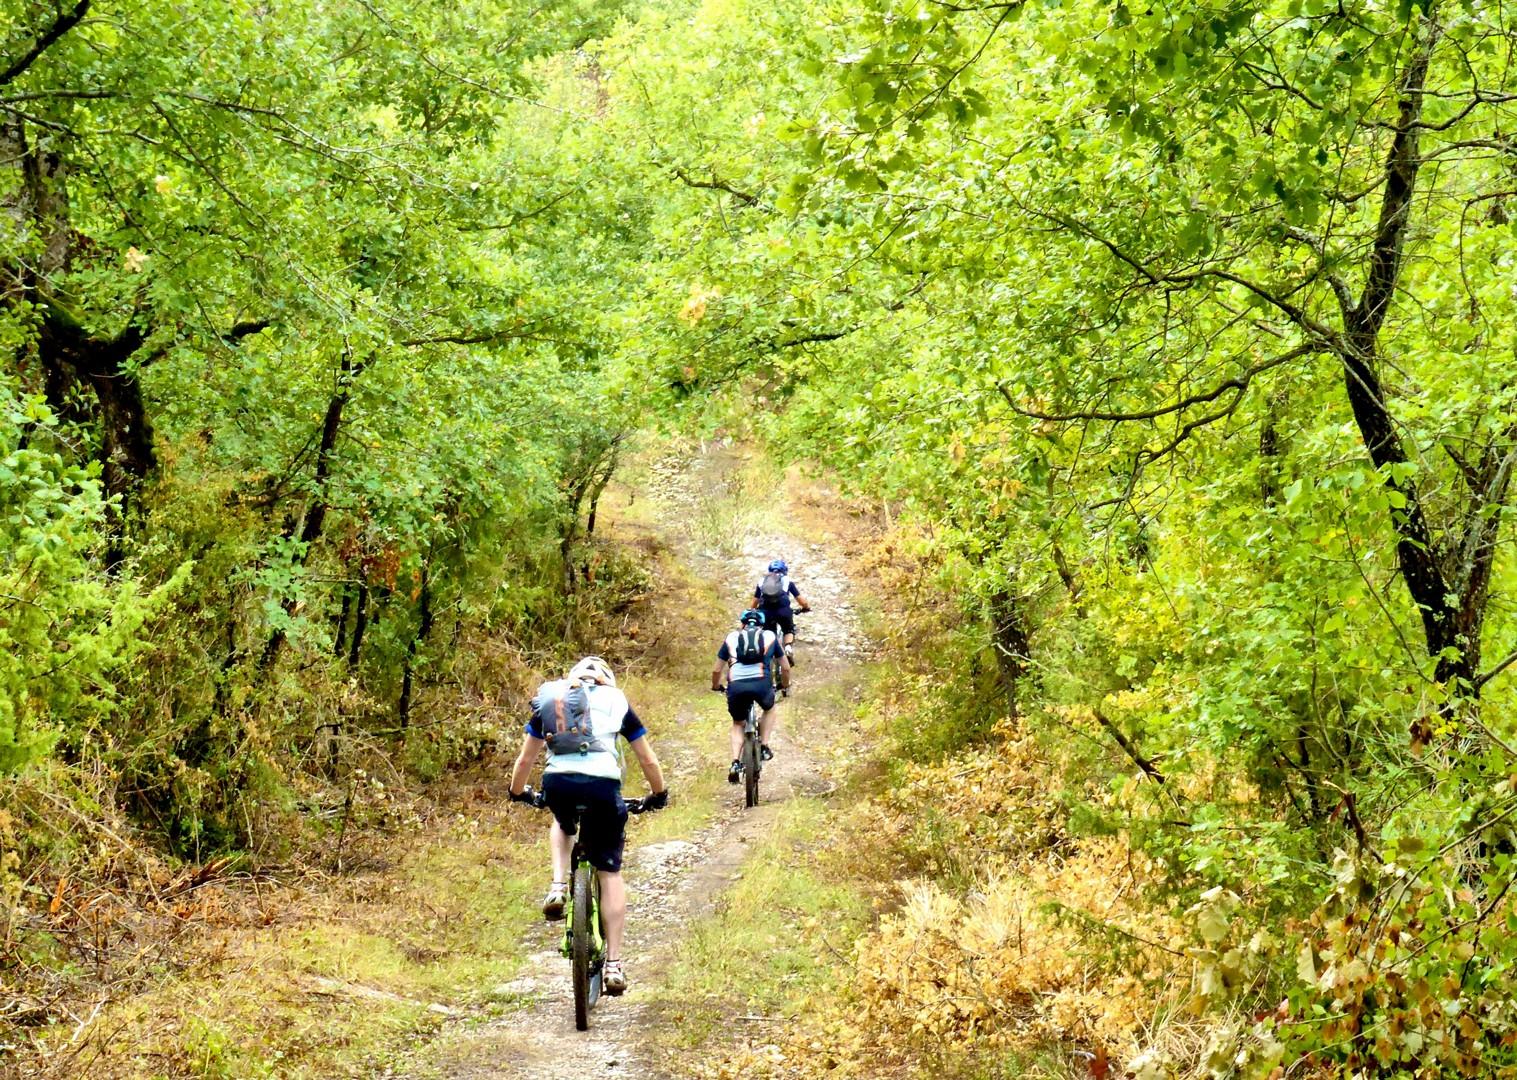 Foto 11-09-17, 10 21 59.jpg - Italy - Via Francigena (Tuscany to Rome) - Guided Mountain Biking Holiday - Mountain Biking